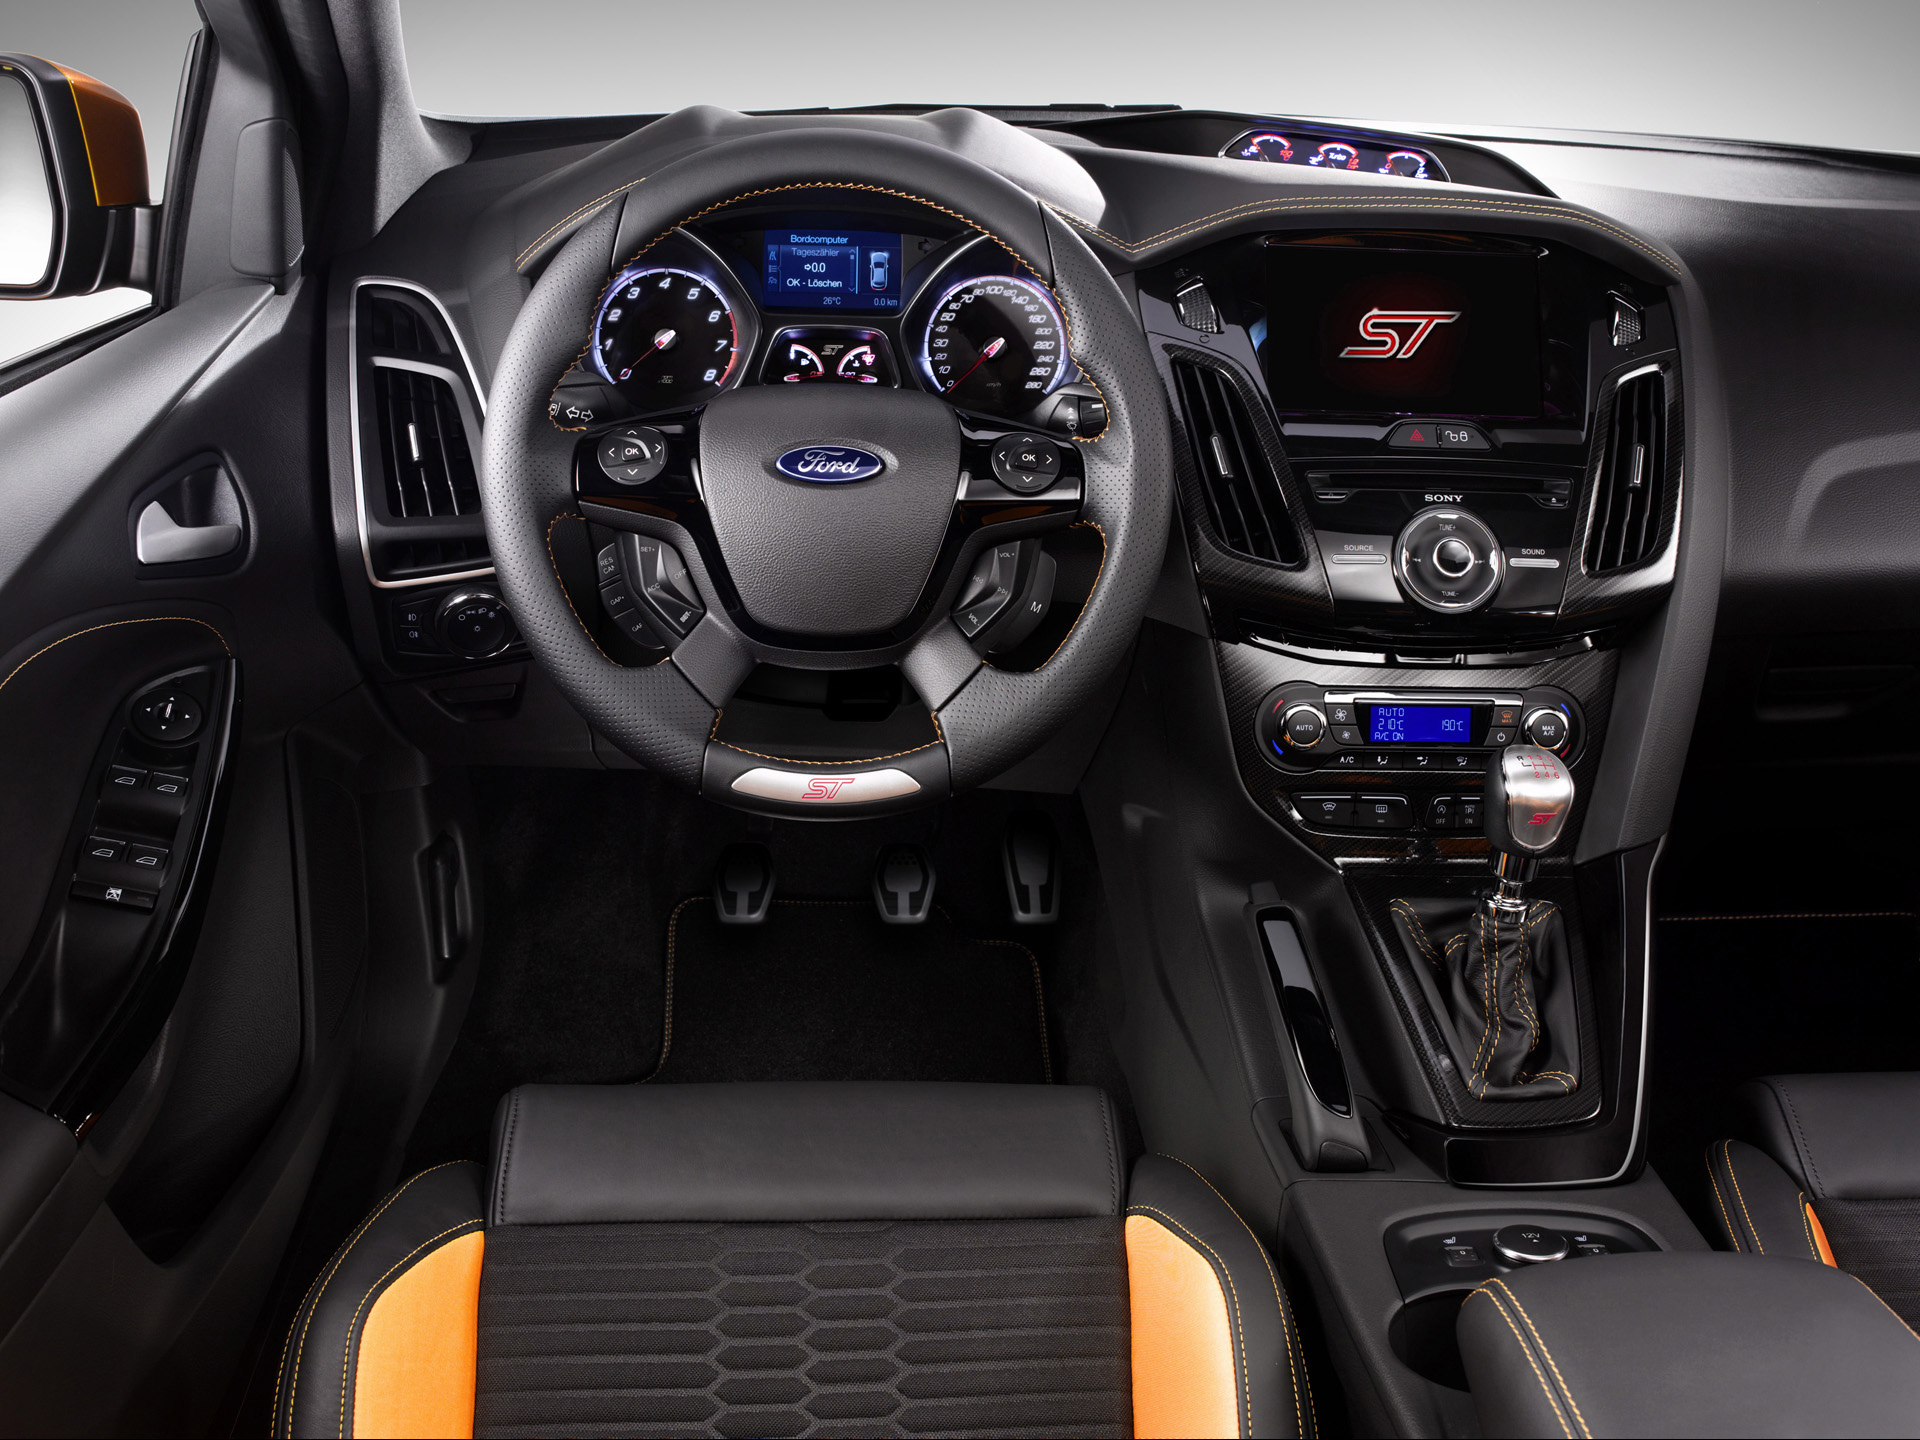 2012 ford focus st dashboard 1920x1440jpg